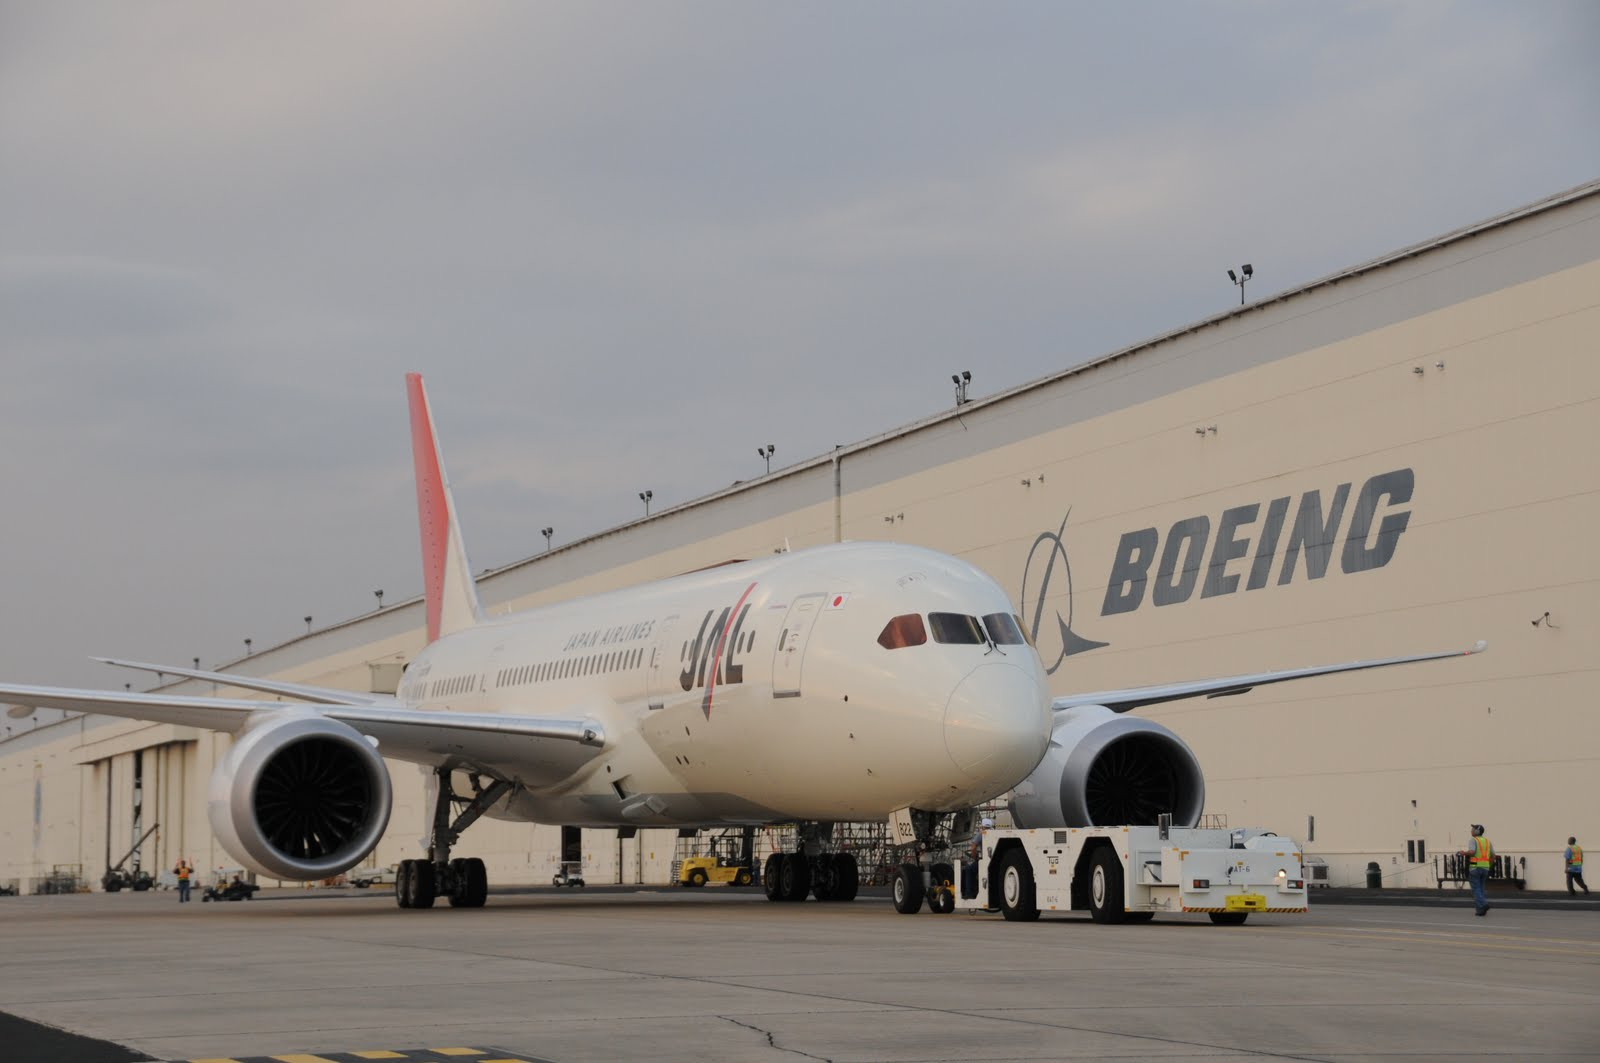 http://2.bp.blogspot.com/-noM0zEx6Ozk/T4wuhlRvVdI/AAAAAAAAH6M/1jAH3tyP5SQ/s1600/boeing_787_dreamliner_jal_japan.jpg